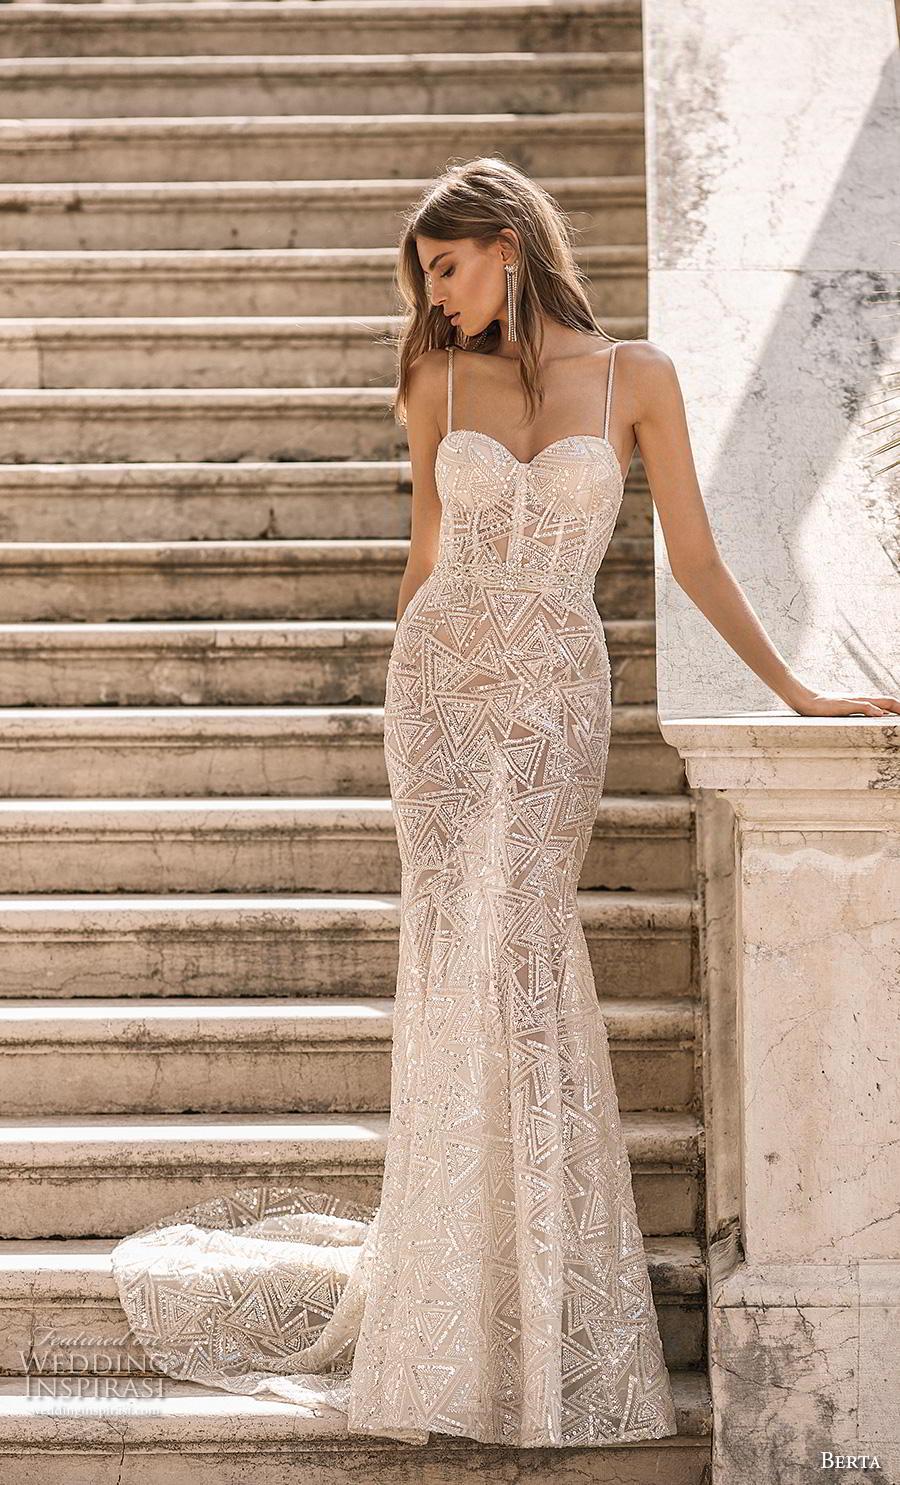 berta 2019 privee bridal thin strap sweetheart neckline full embellishment bustier glitzy glamorous elegant sheath wedding dress backless chapel train (8) mv